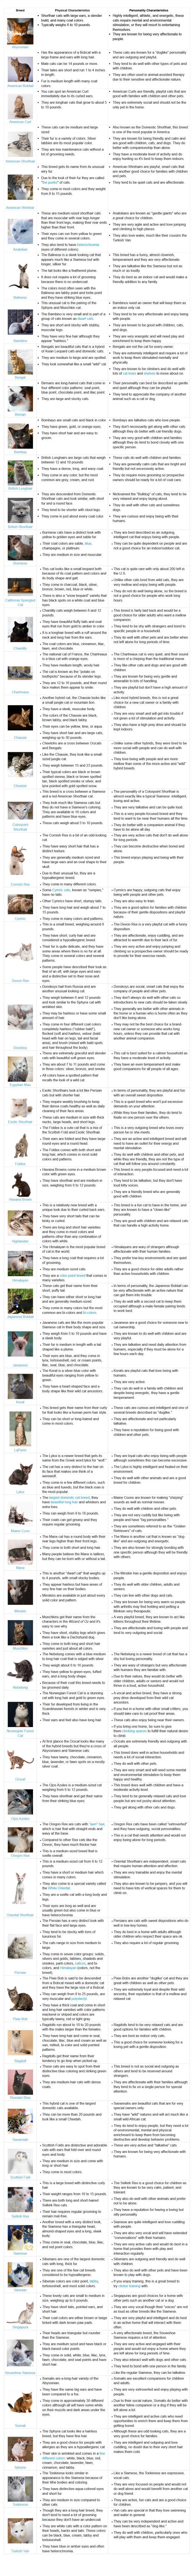 Cat Breed Characteristics Chart